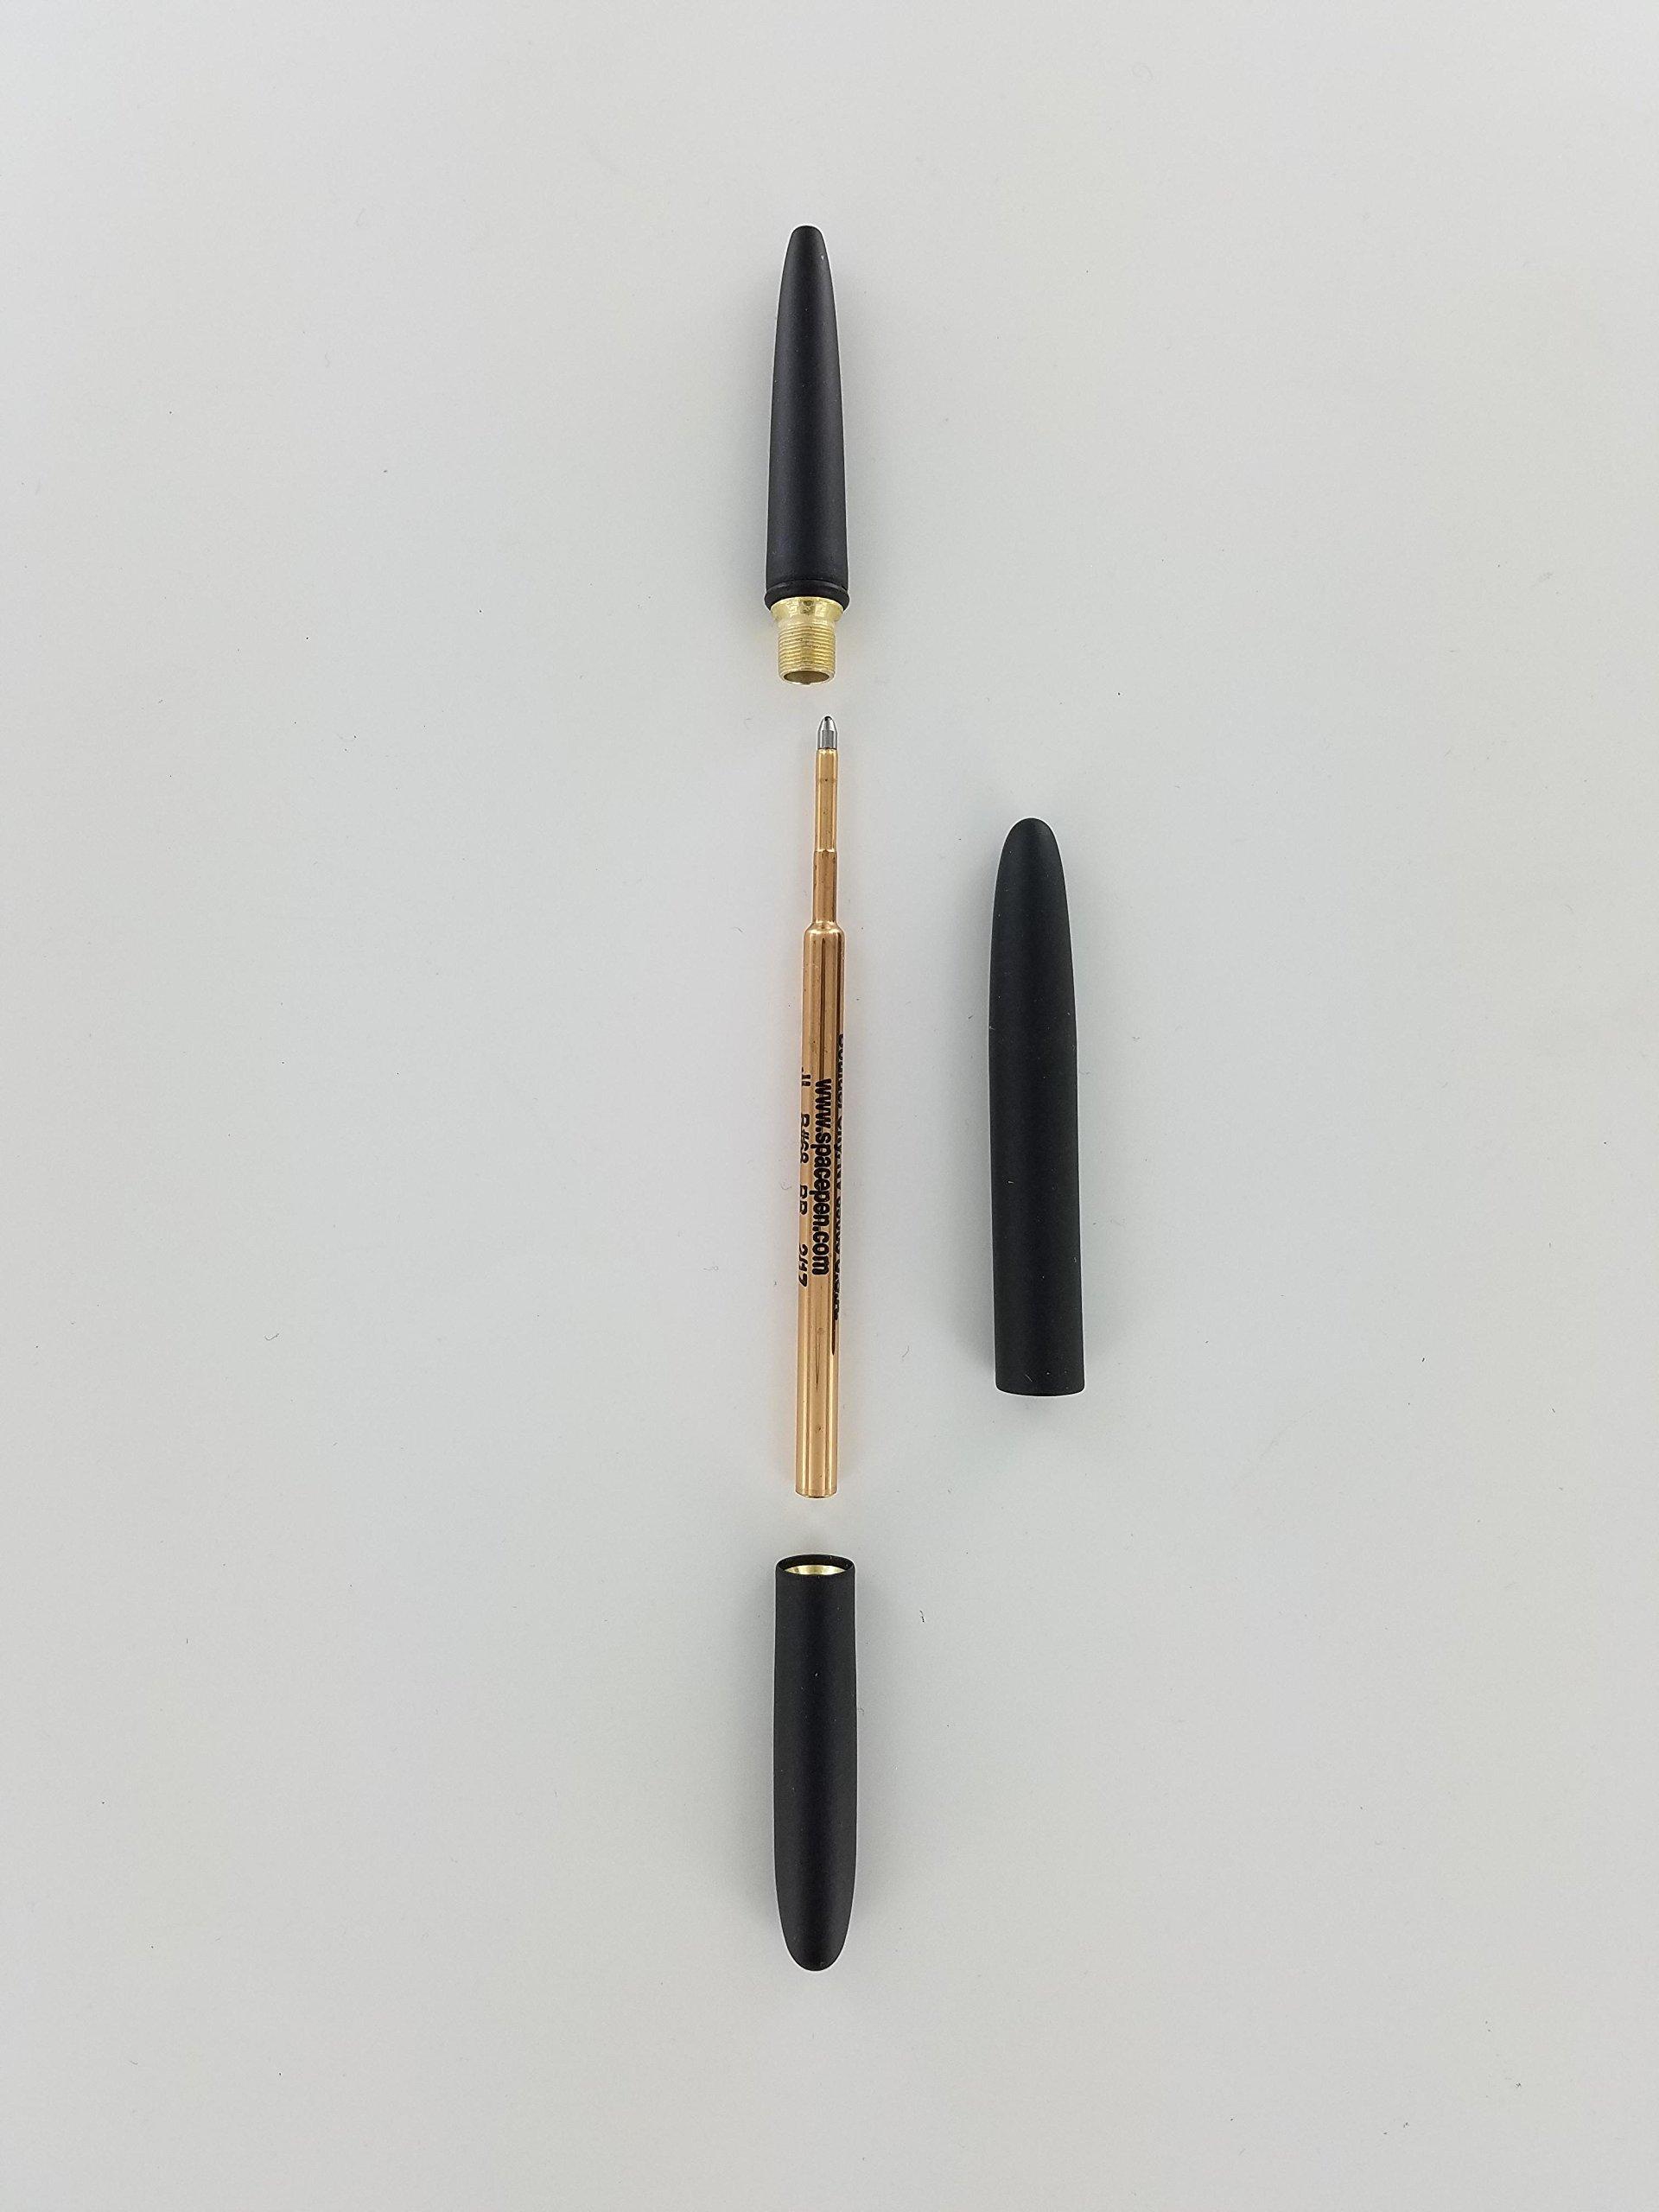 Fisher 400B Space Bullet Space Pen - Matte Black